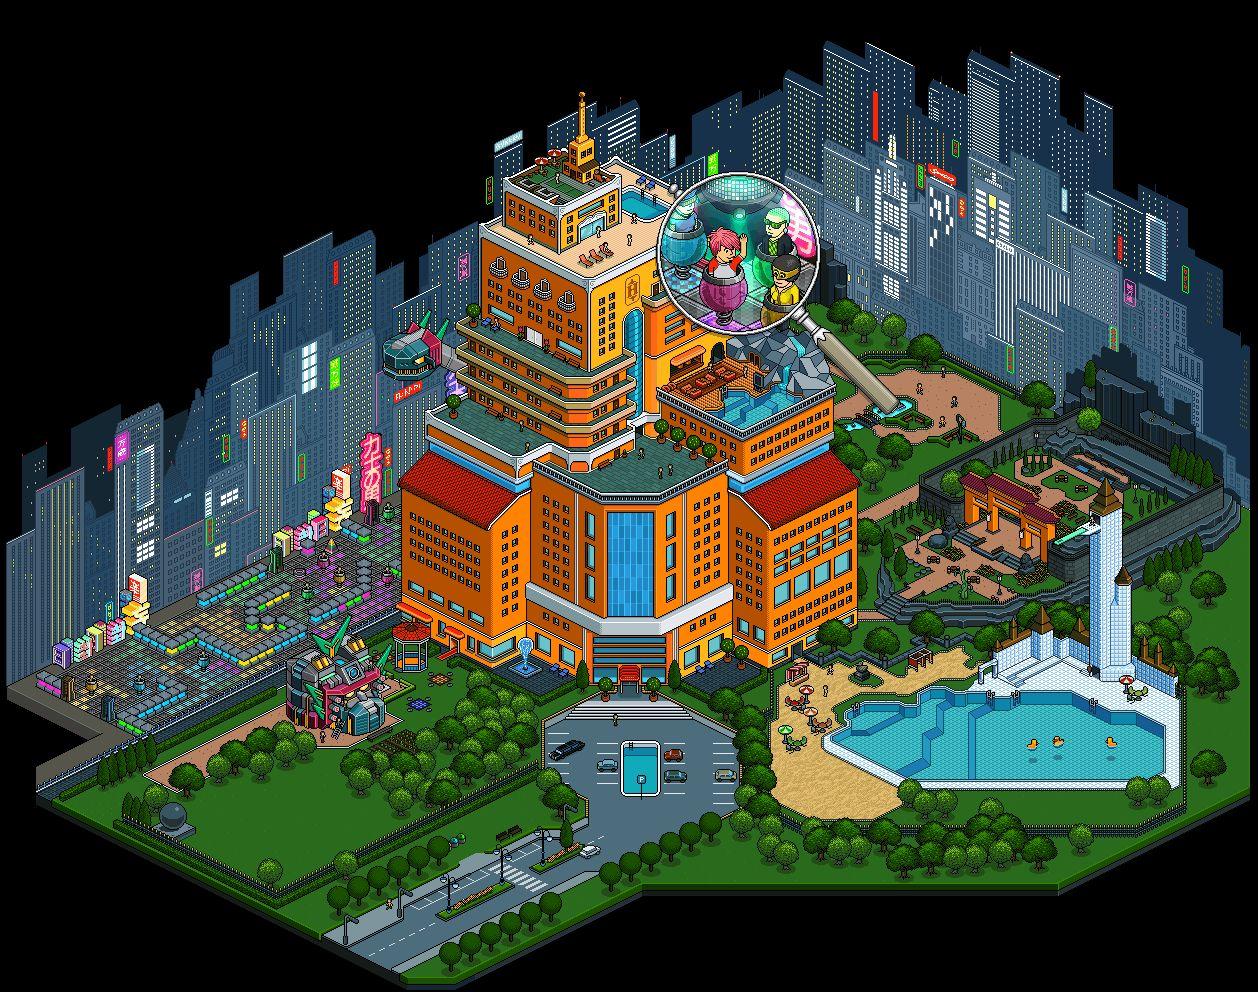 Habbo Hotel - MMOGames.com